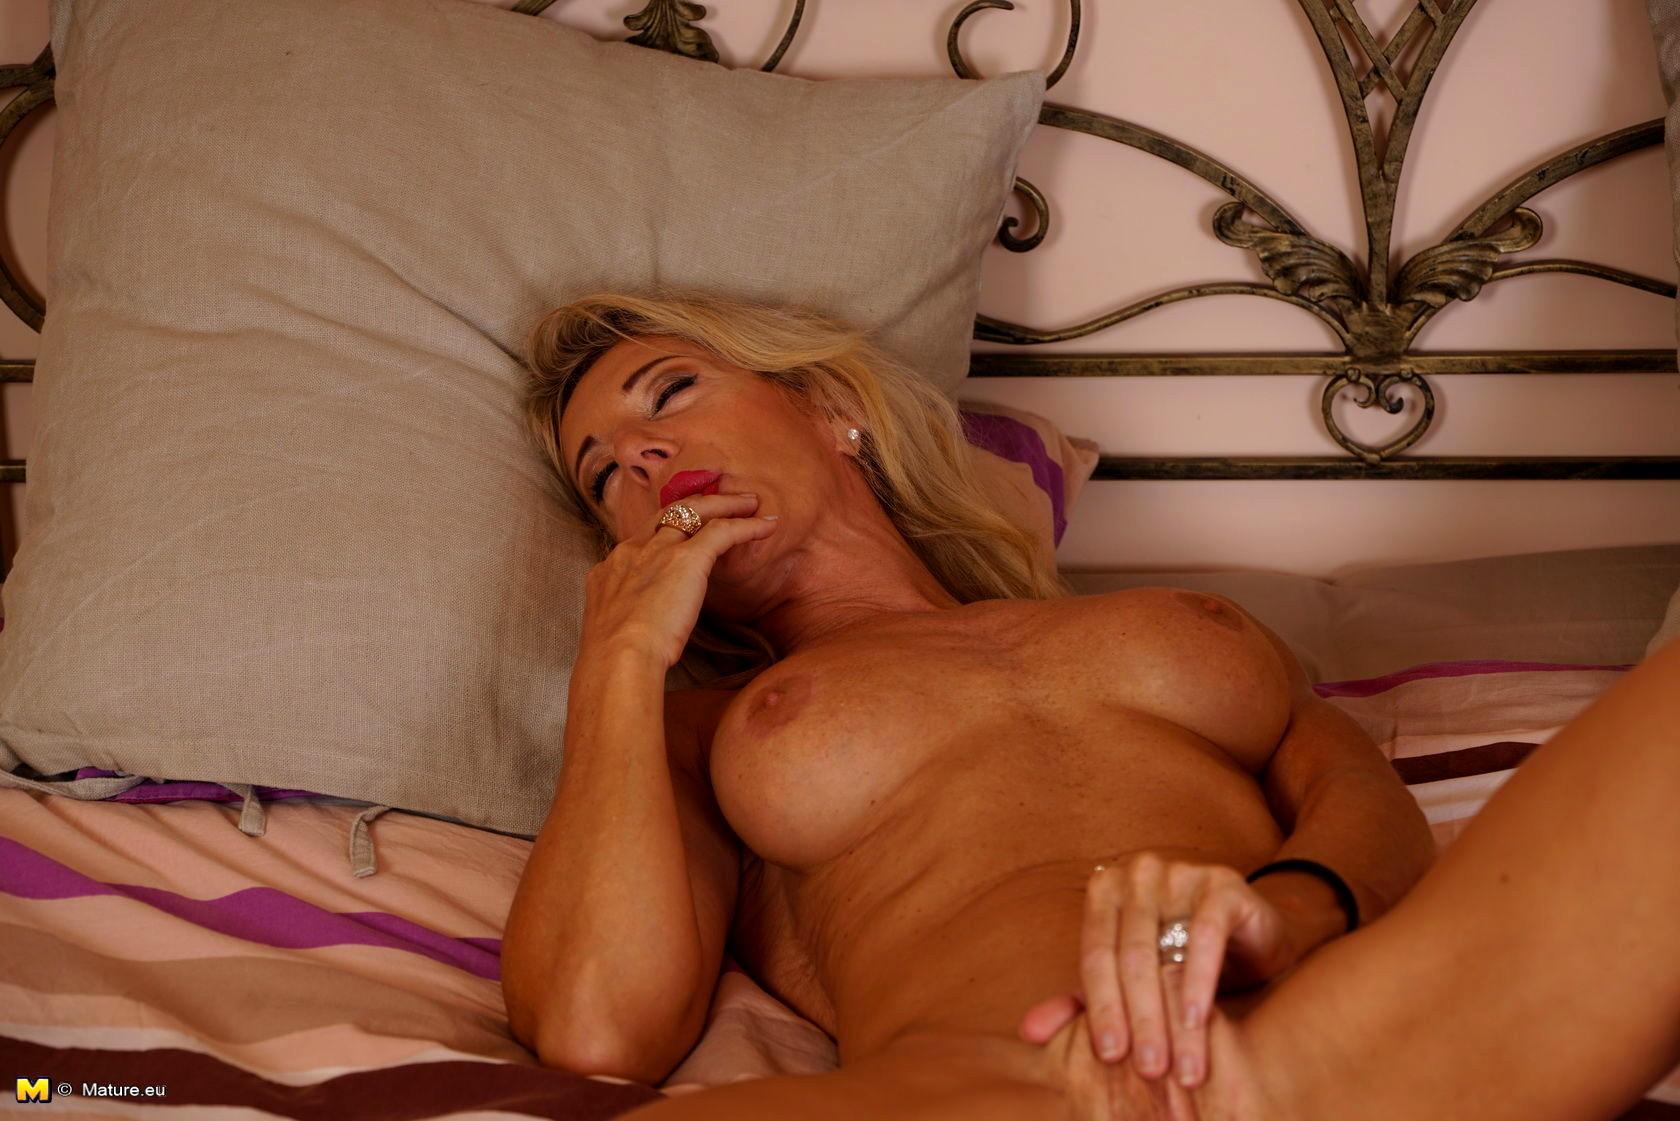 Dirty talk blonde sensual lingerie